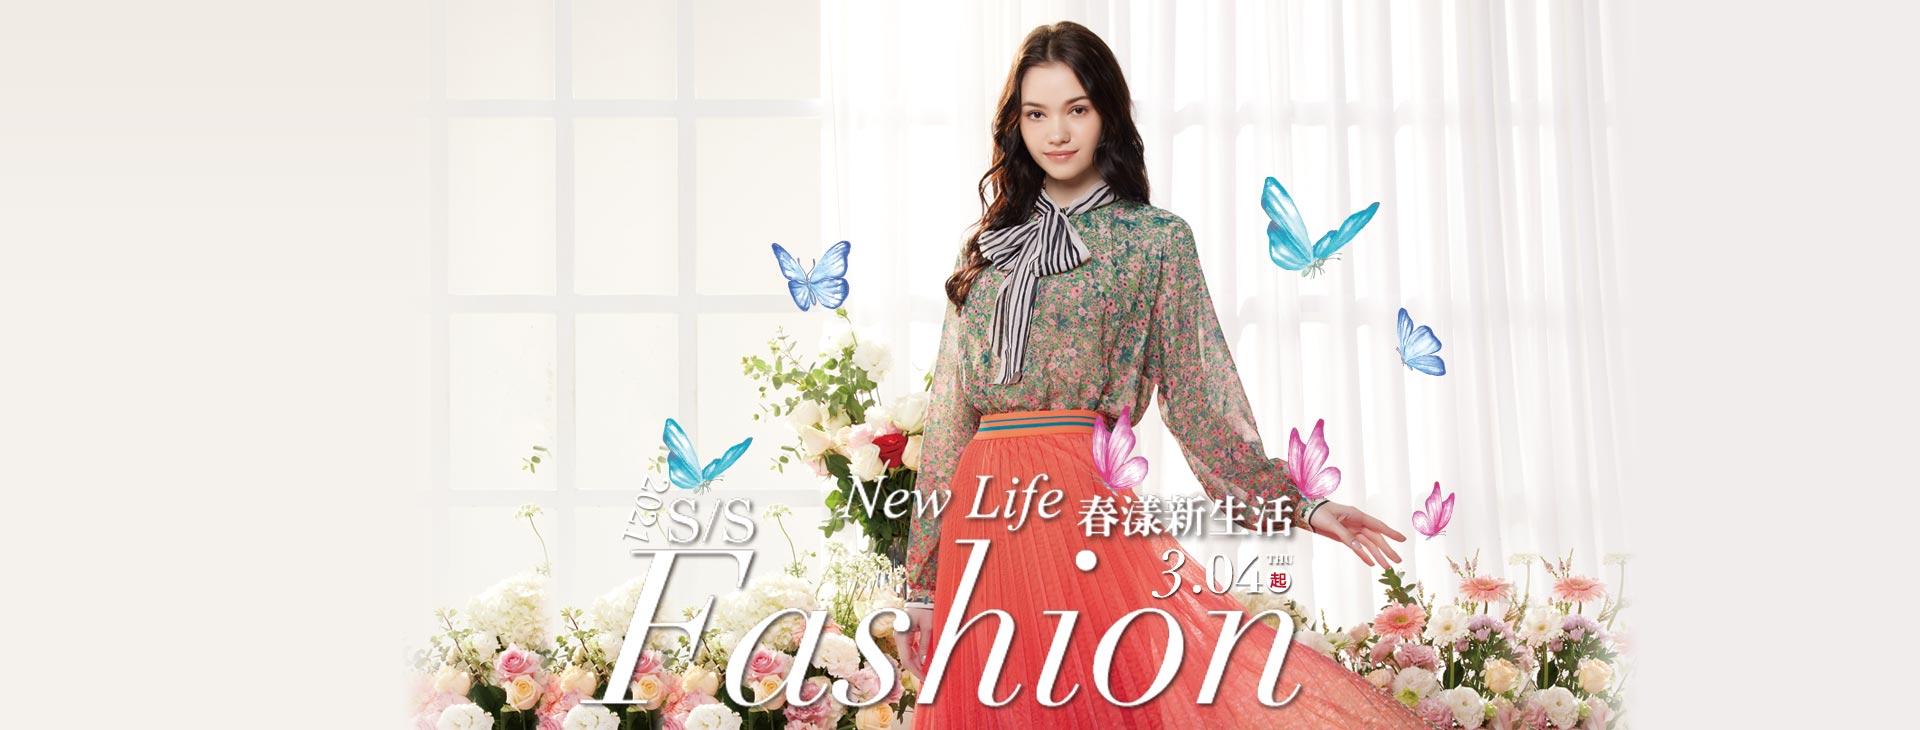 New Life New Fashion春漾新生活